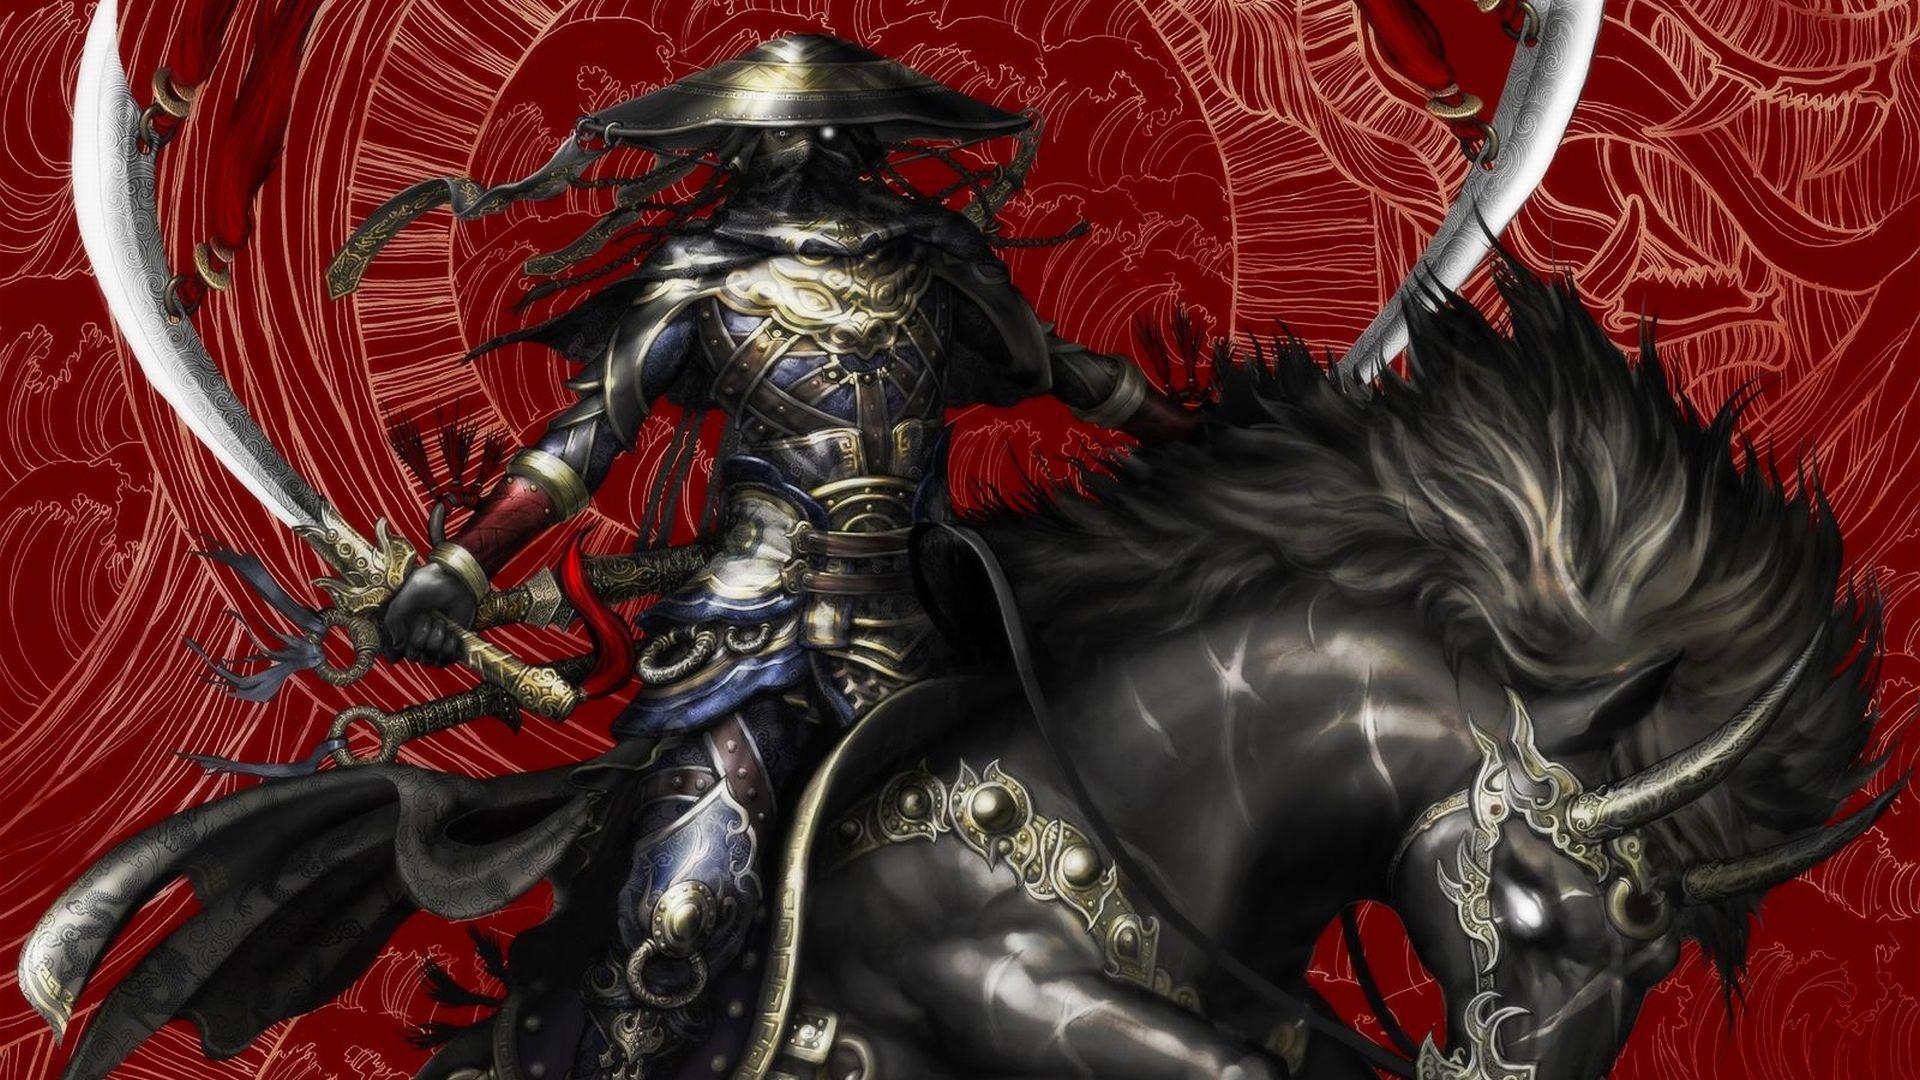 Samurai Armor Wallpaper Full HD HD Quality Resolution 1920x1080 px 1.43 MB